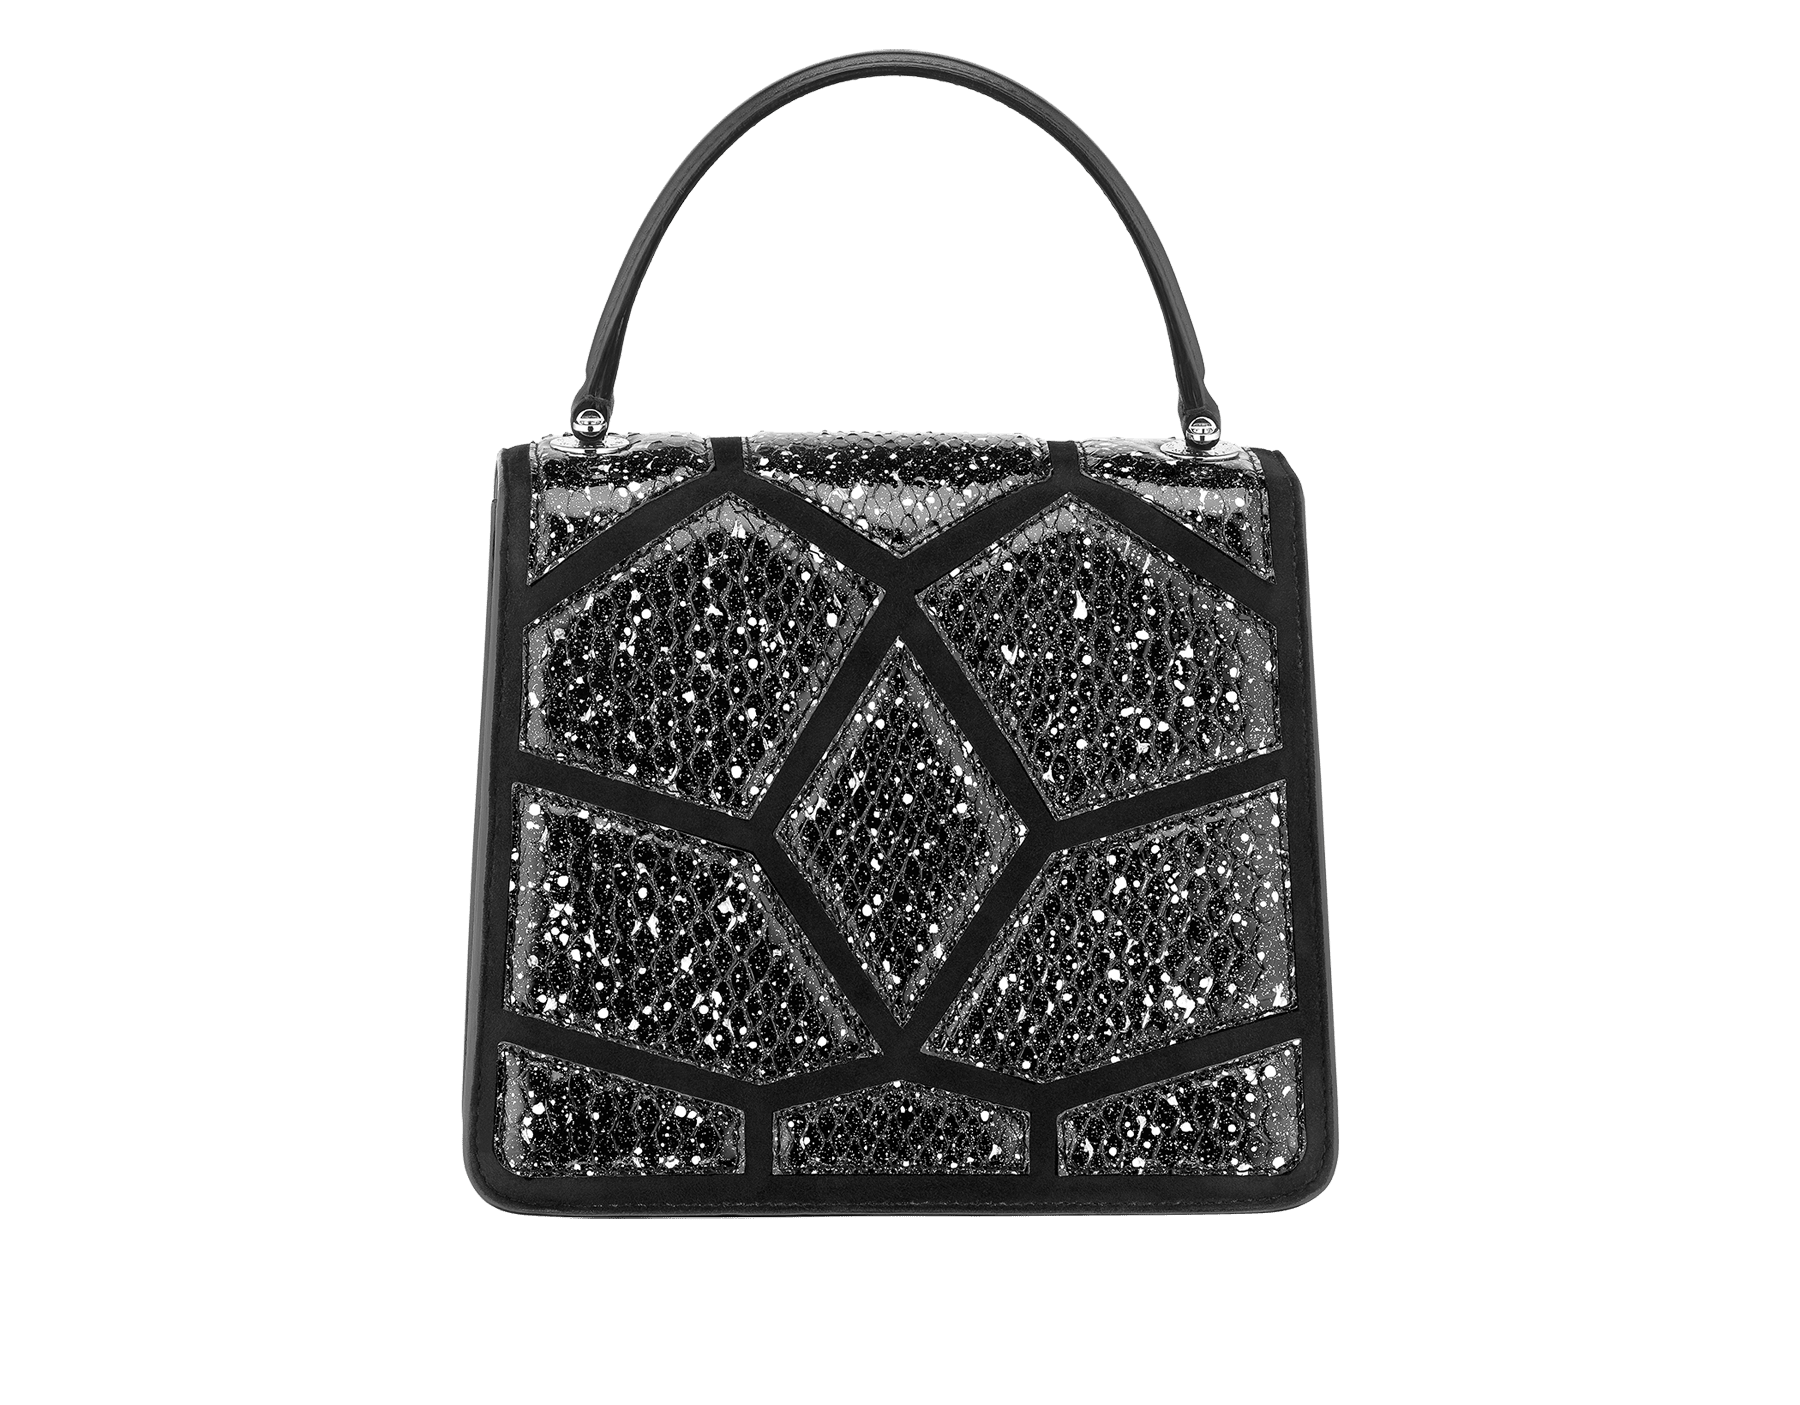 Serpenti Forever 斜背包採用黑色和白色「宇宙星塵」蟒皮和黑色小牛皮。鍍鈀黃銅蛇頭扣環飾以黑色琺瑯,蛇眼鑲飾黑色縞瑪瑙。 288223 image 3